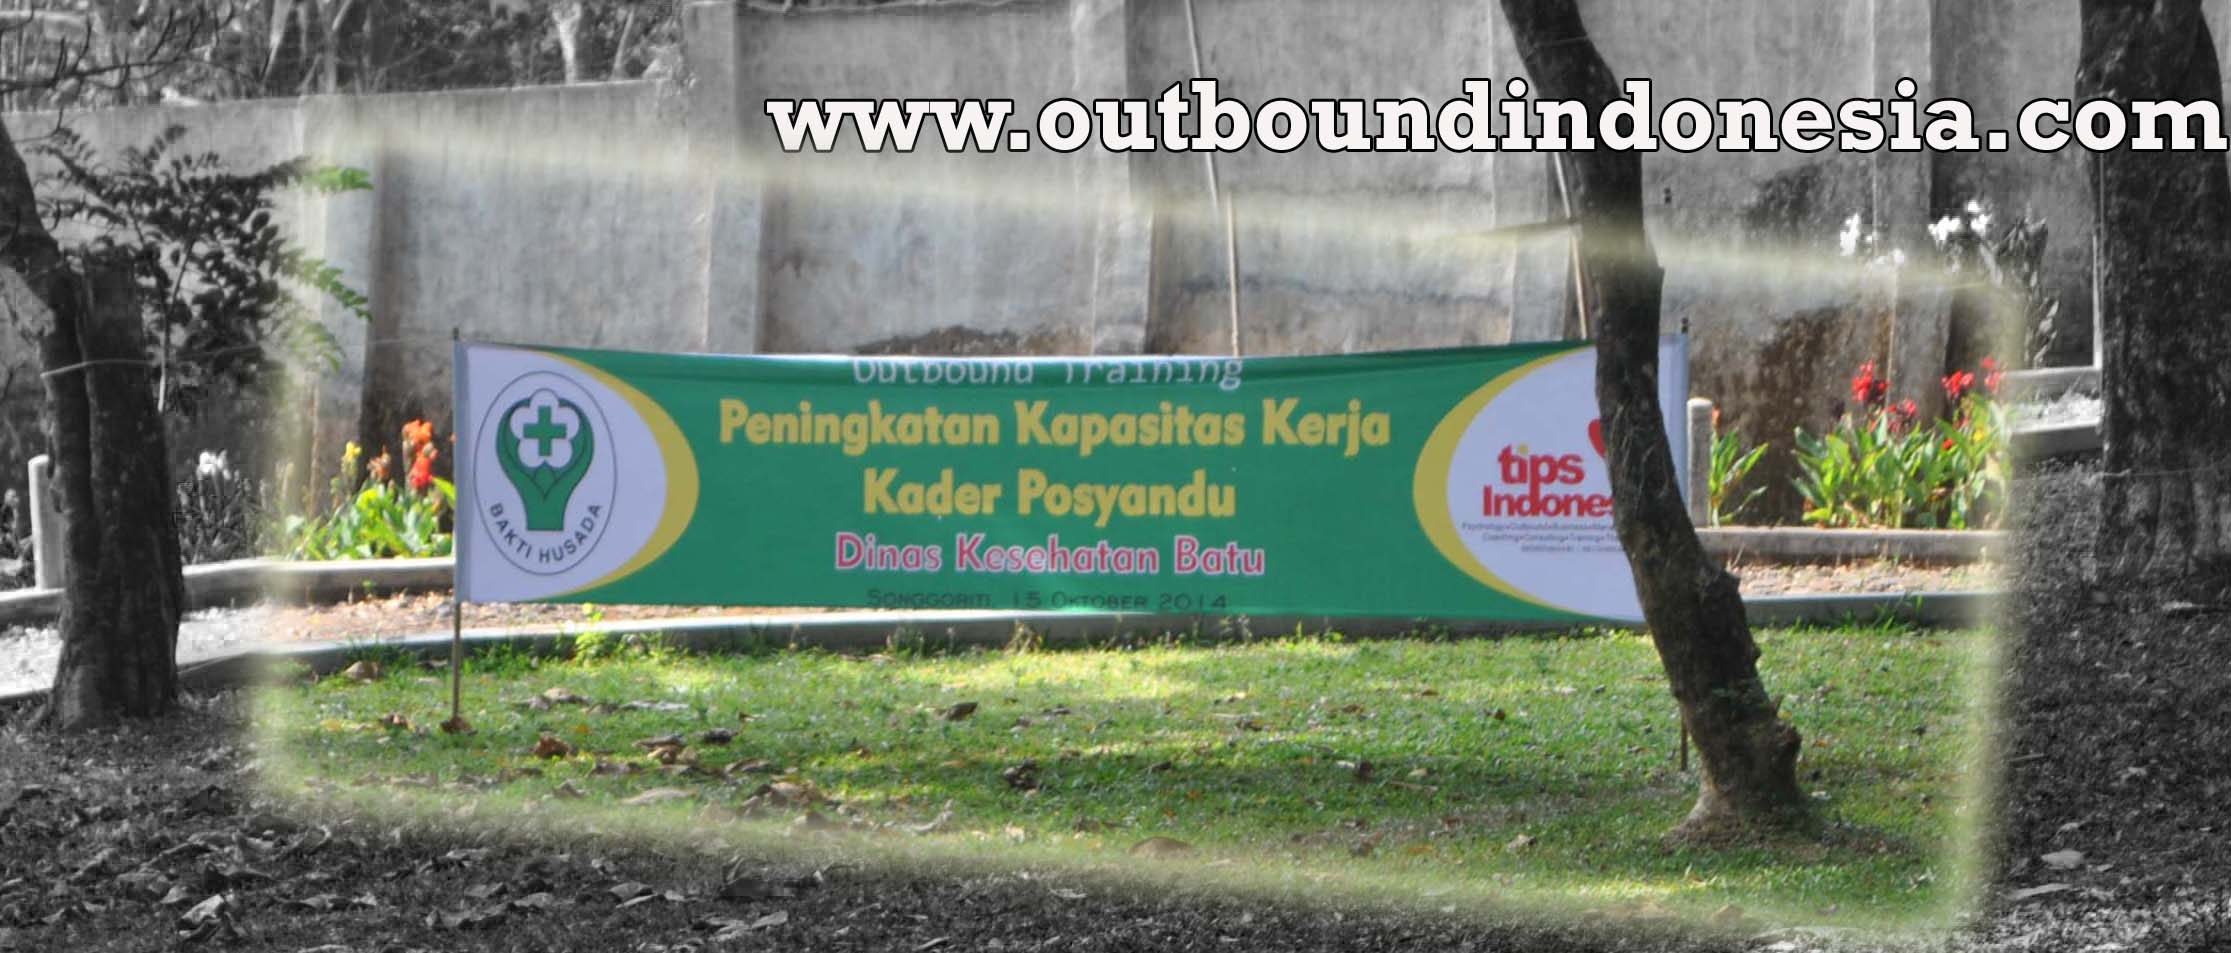 Dinas kesehatan Batu (posyandu), www.outboundindonesia.com, 082231080521